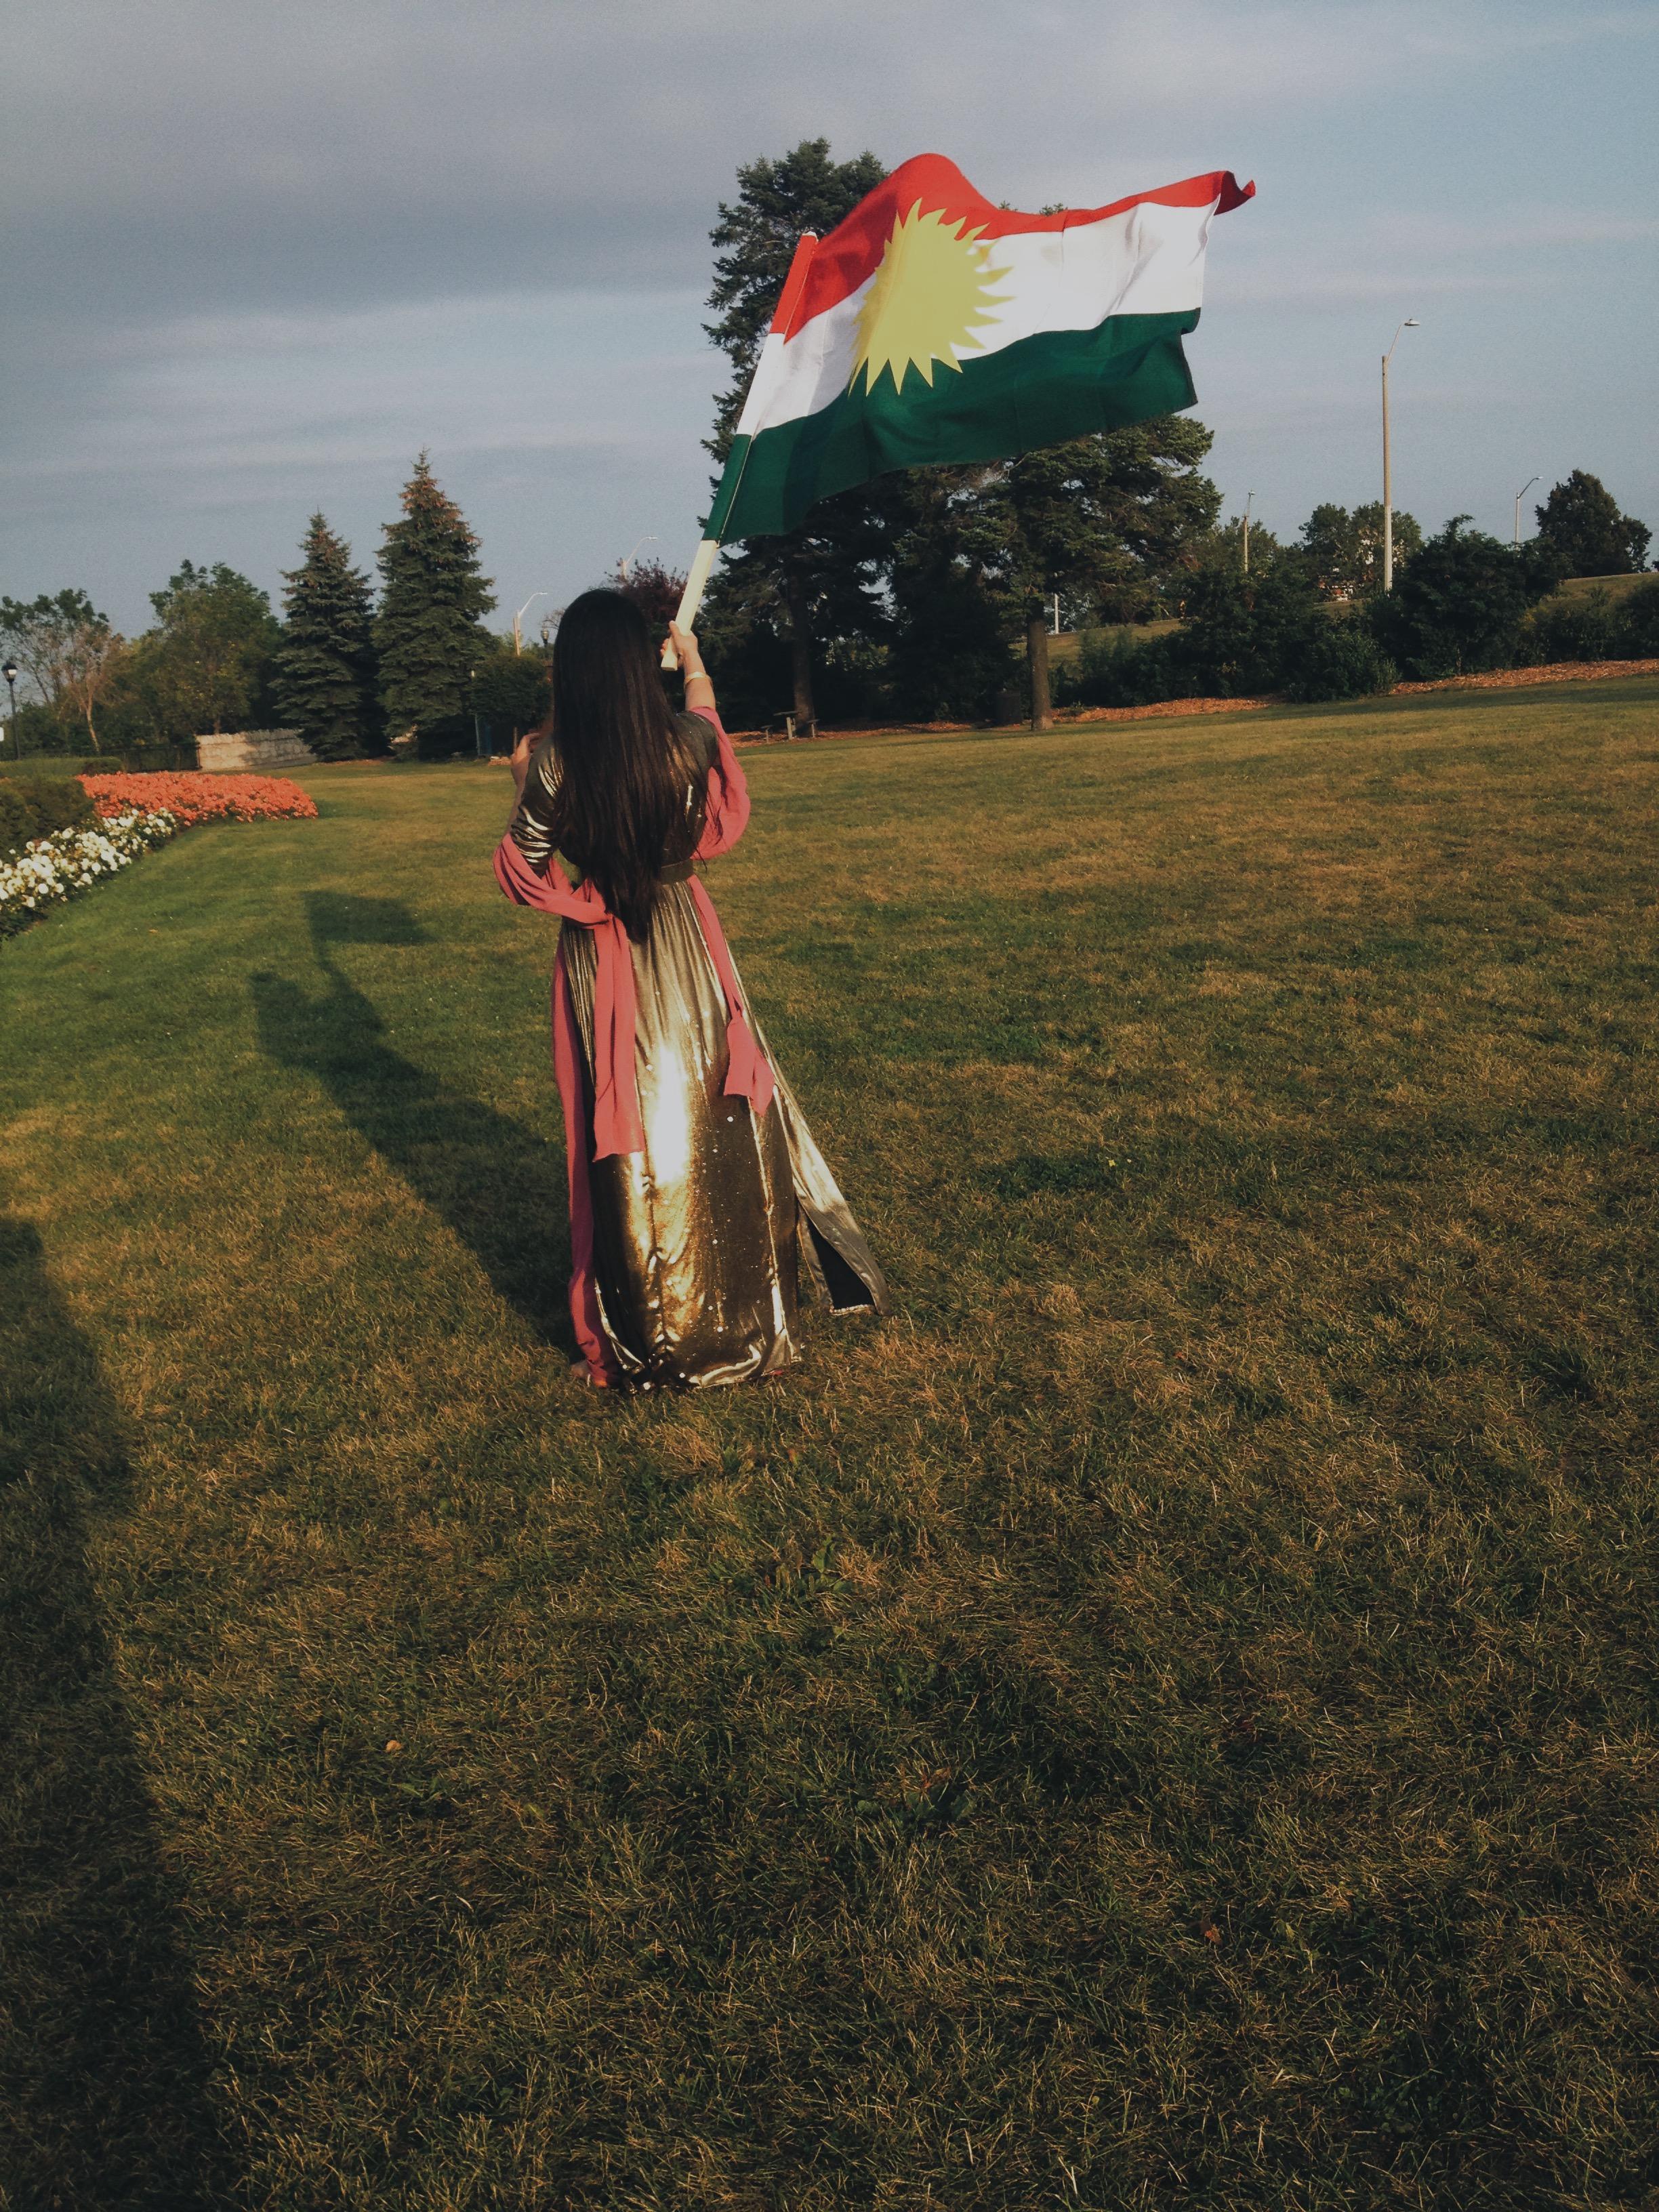 Me with Ala Kurdistanê (The Kurdistan Flag)